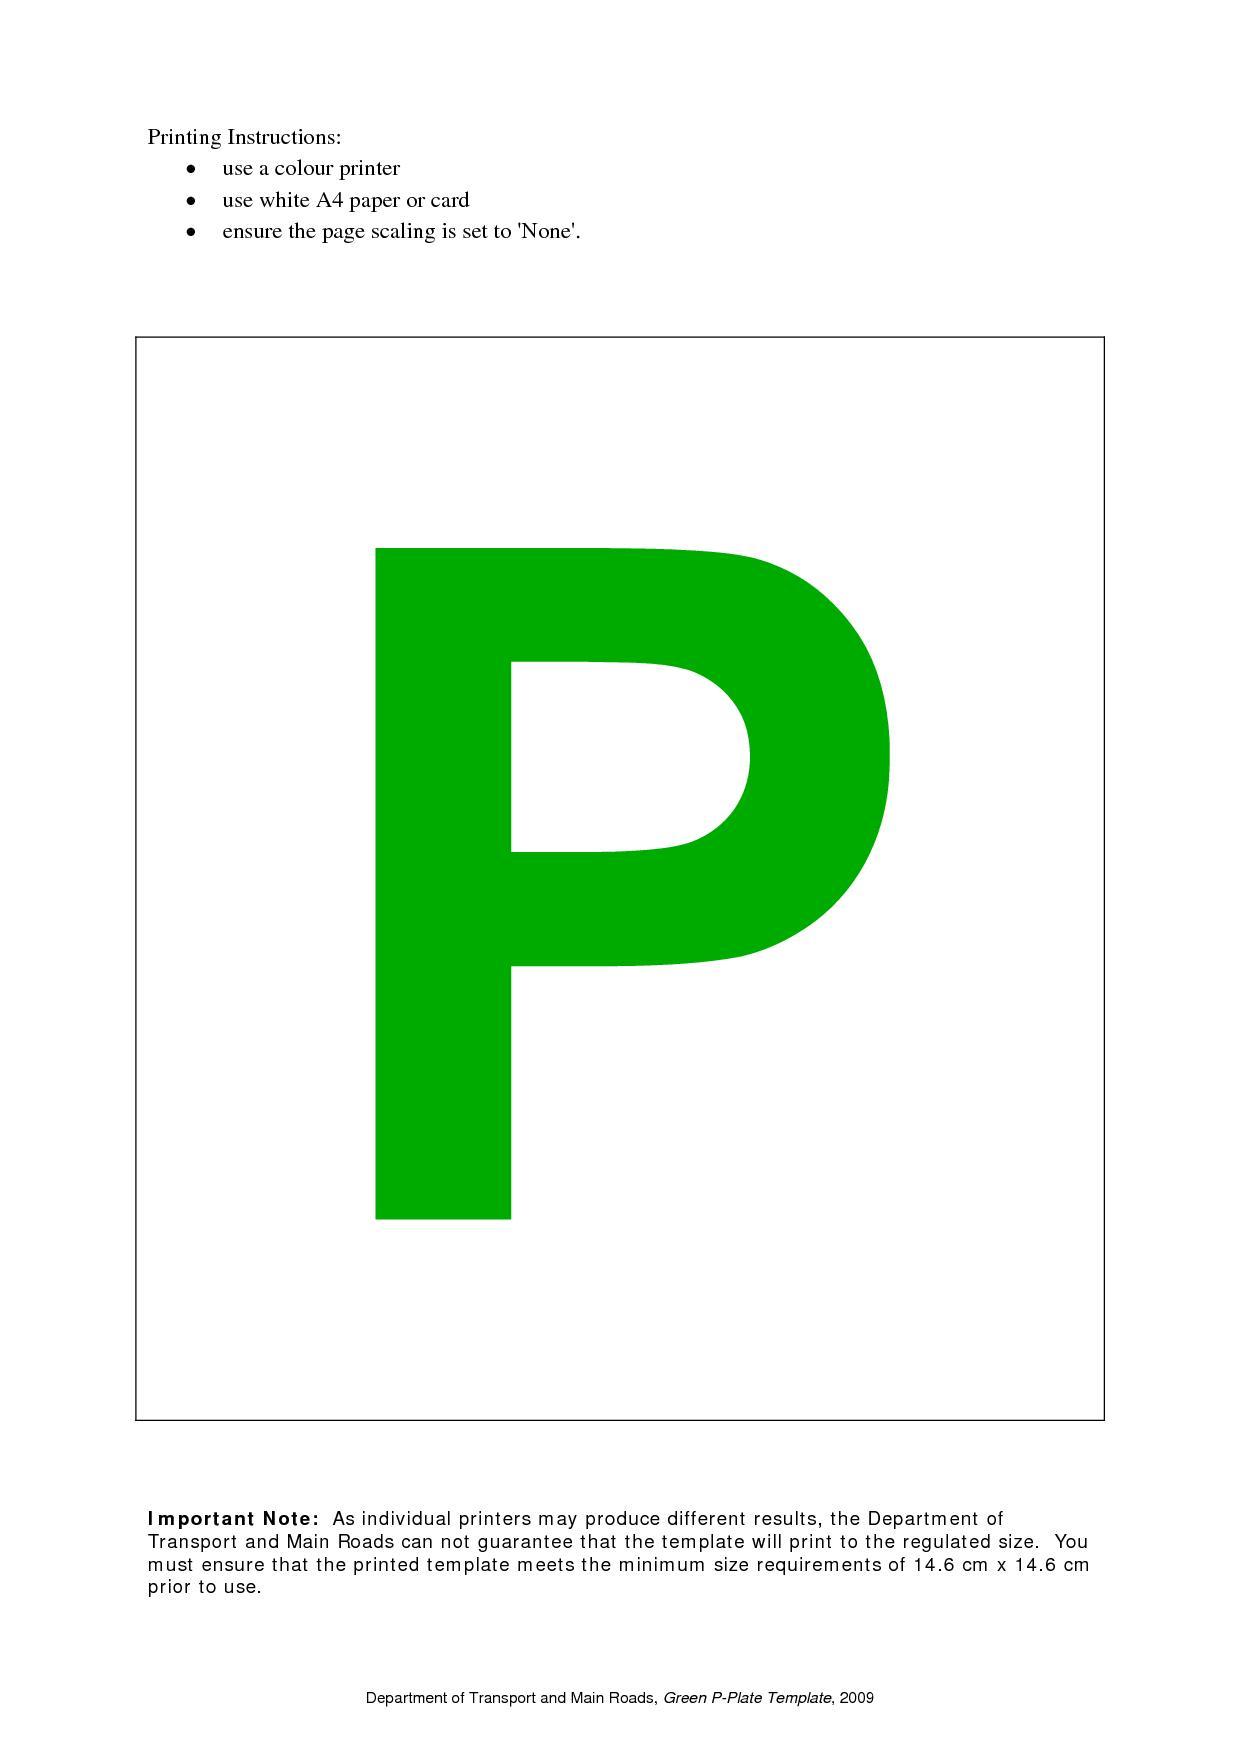 P Plate Template Gallery - Template Design Ideas